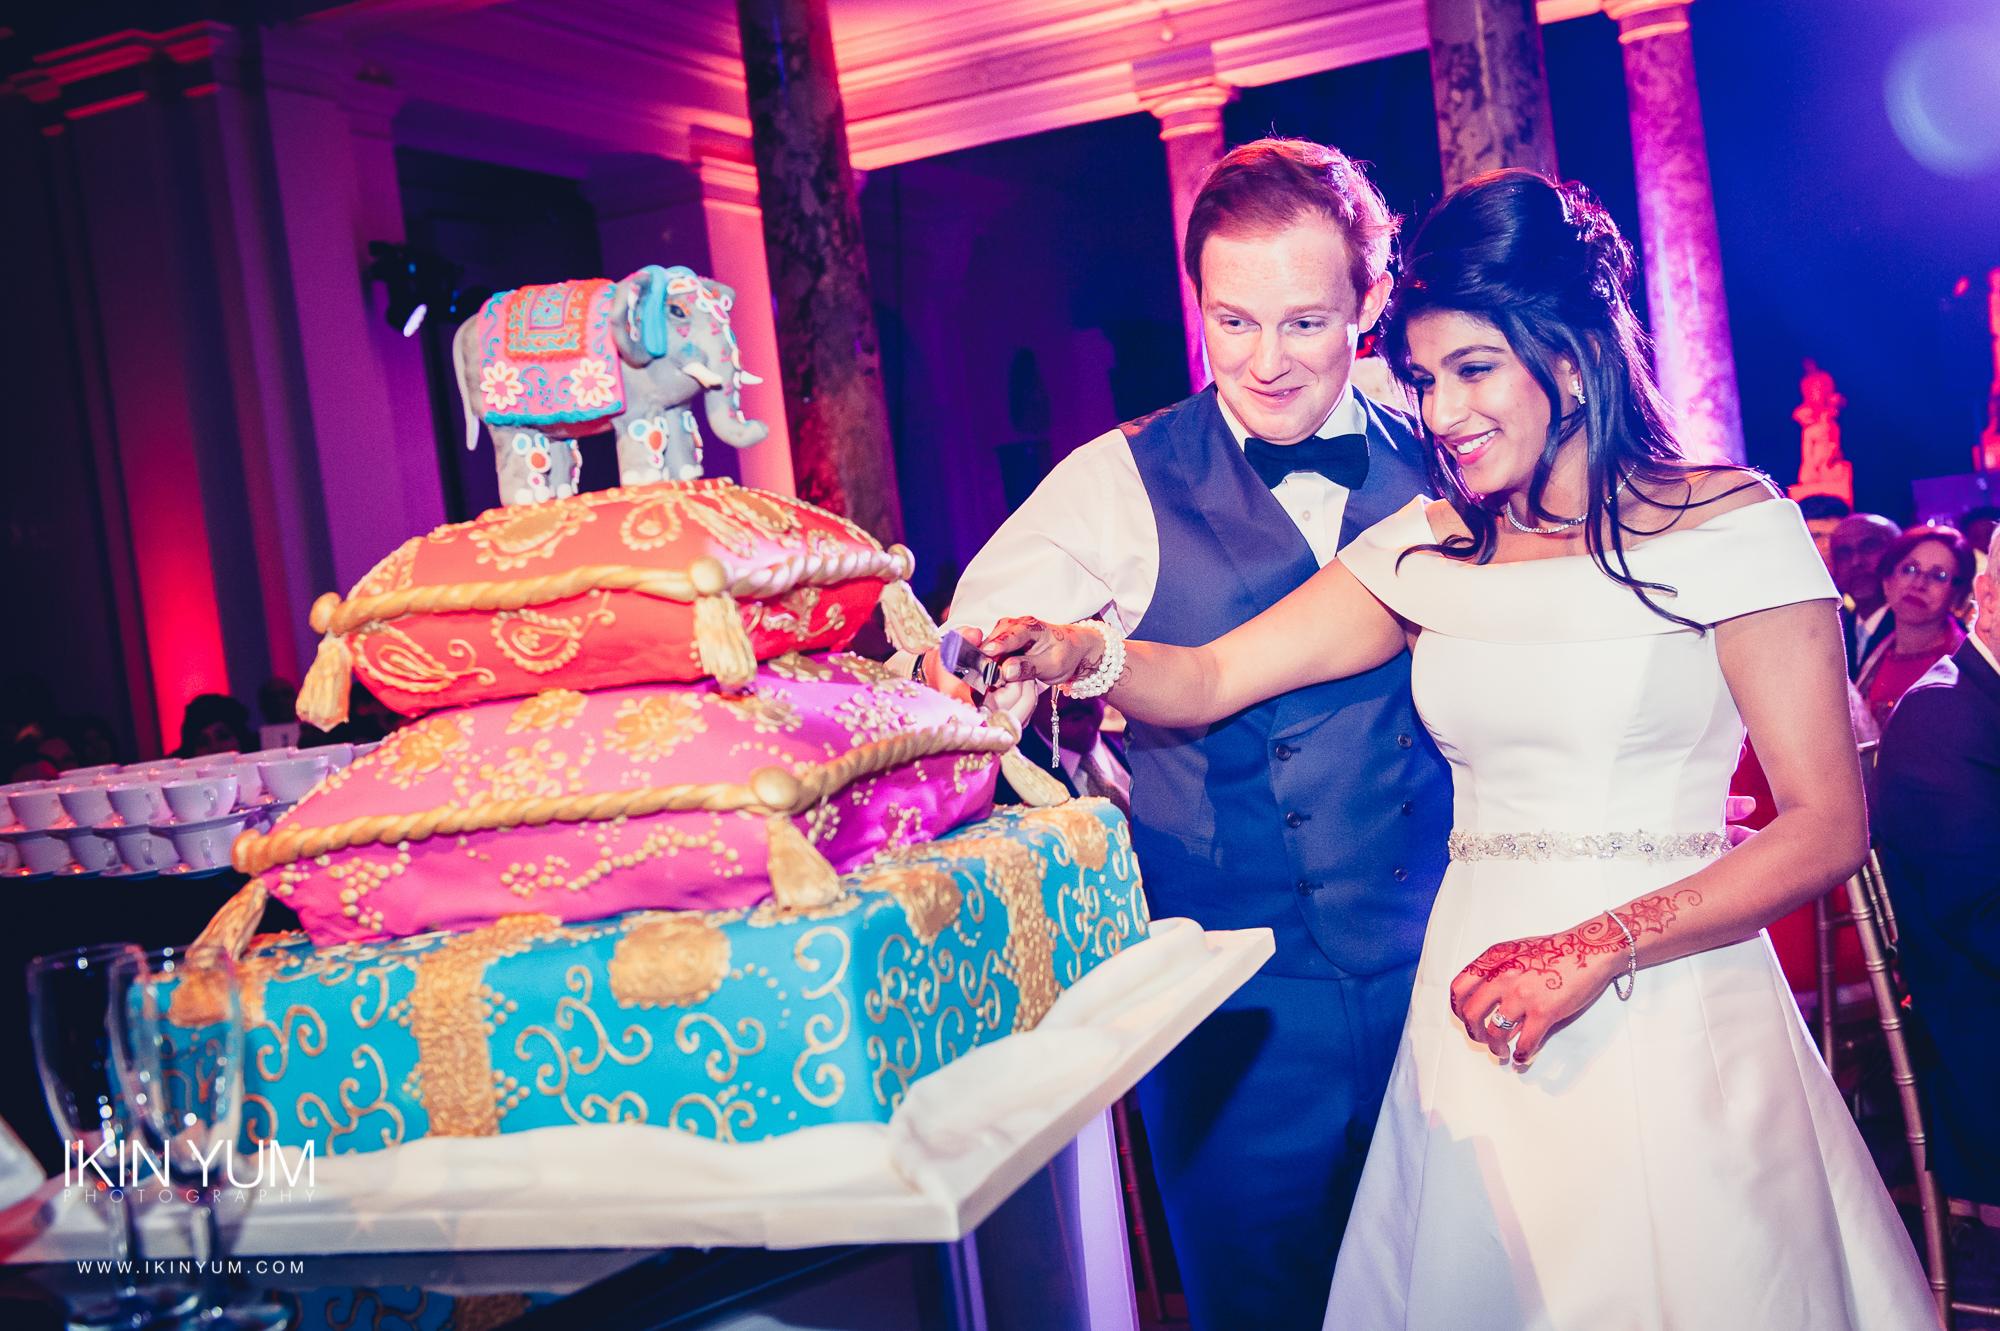 Holland Park Wedding - Ikin Yum Photography-0083.jpg